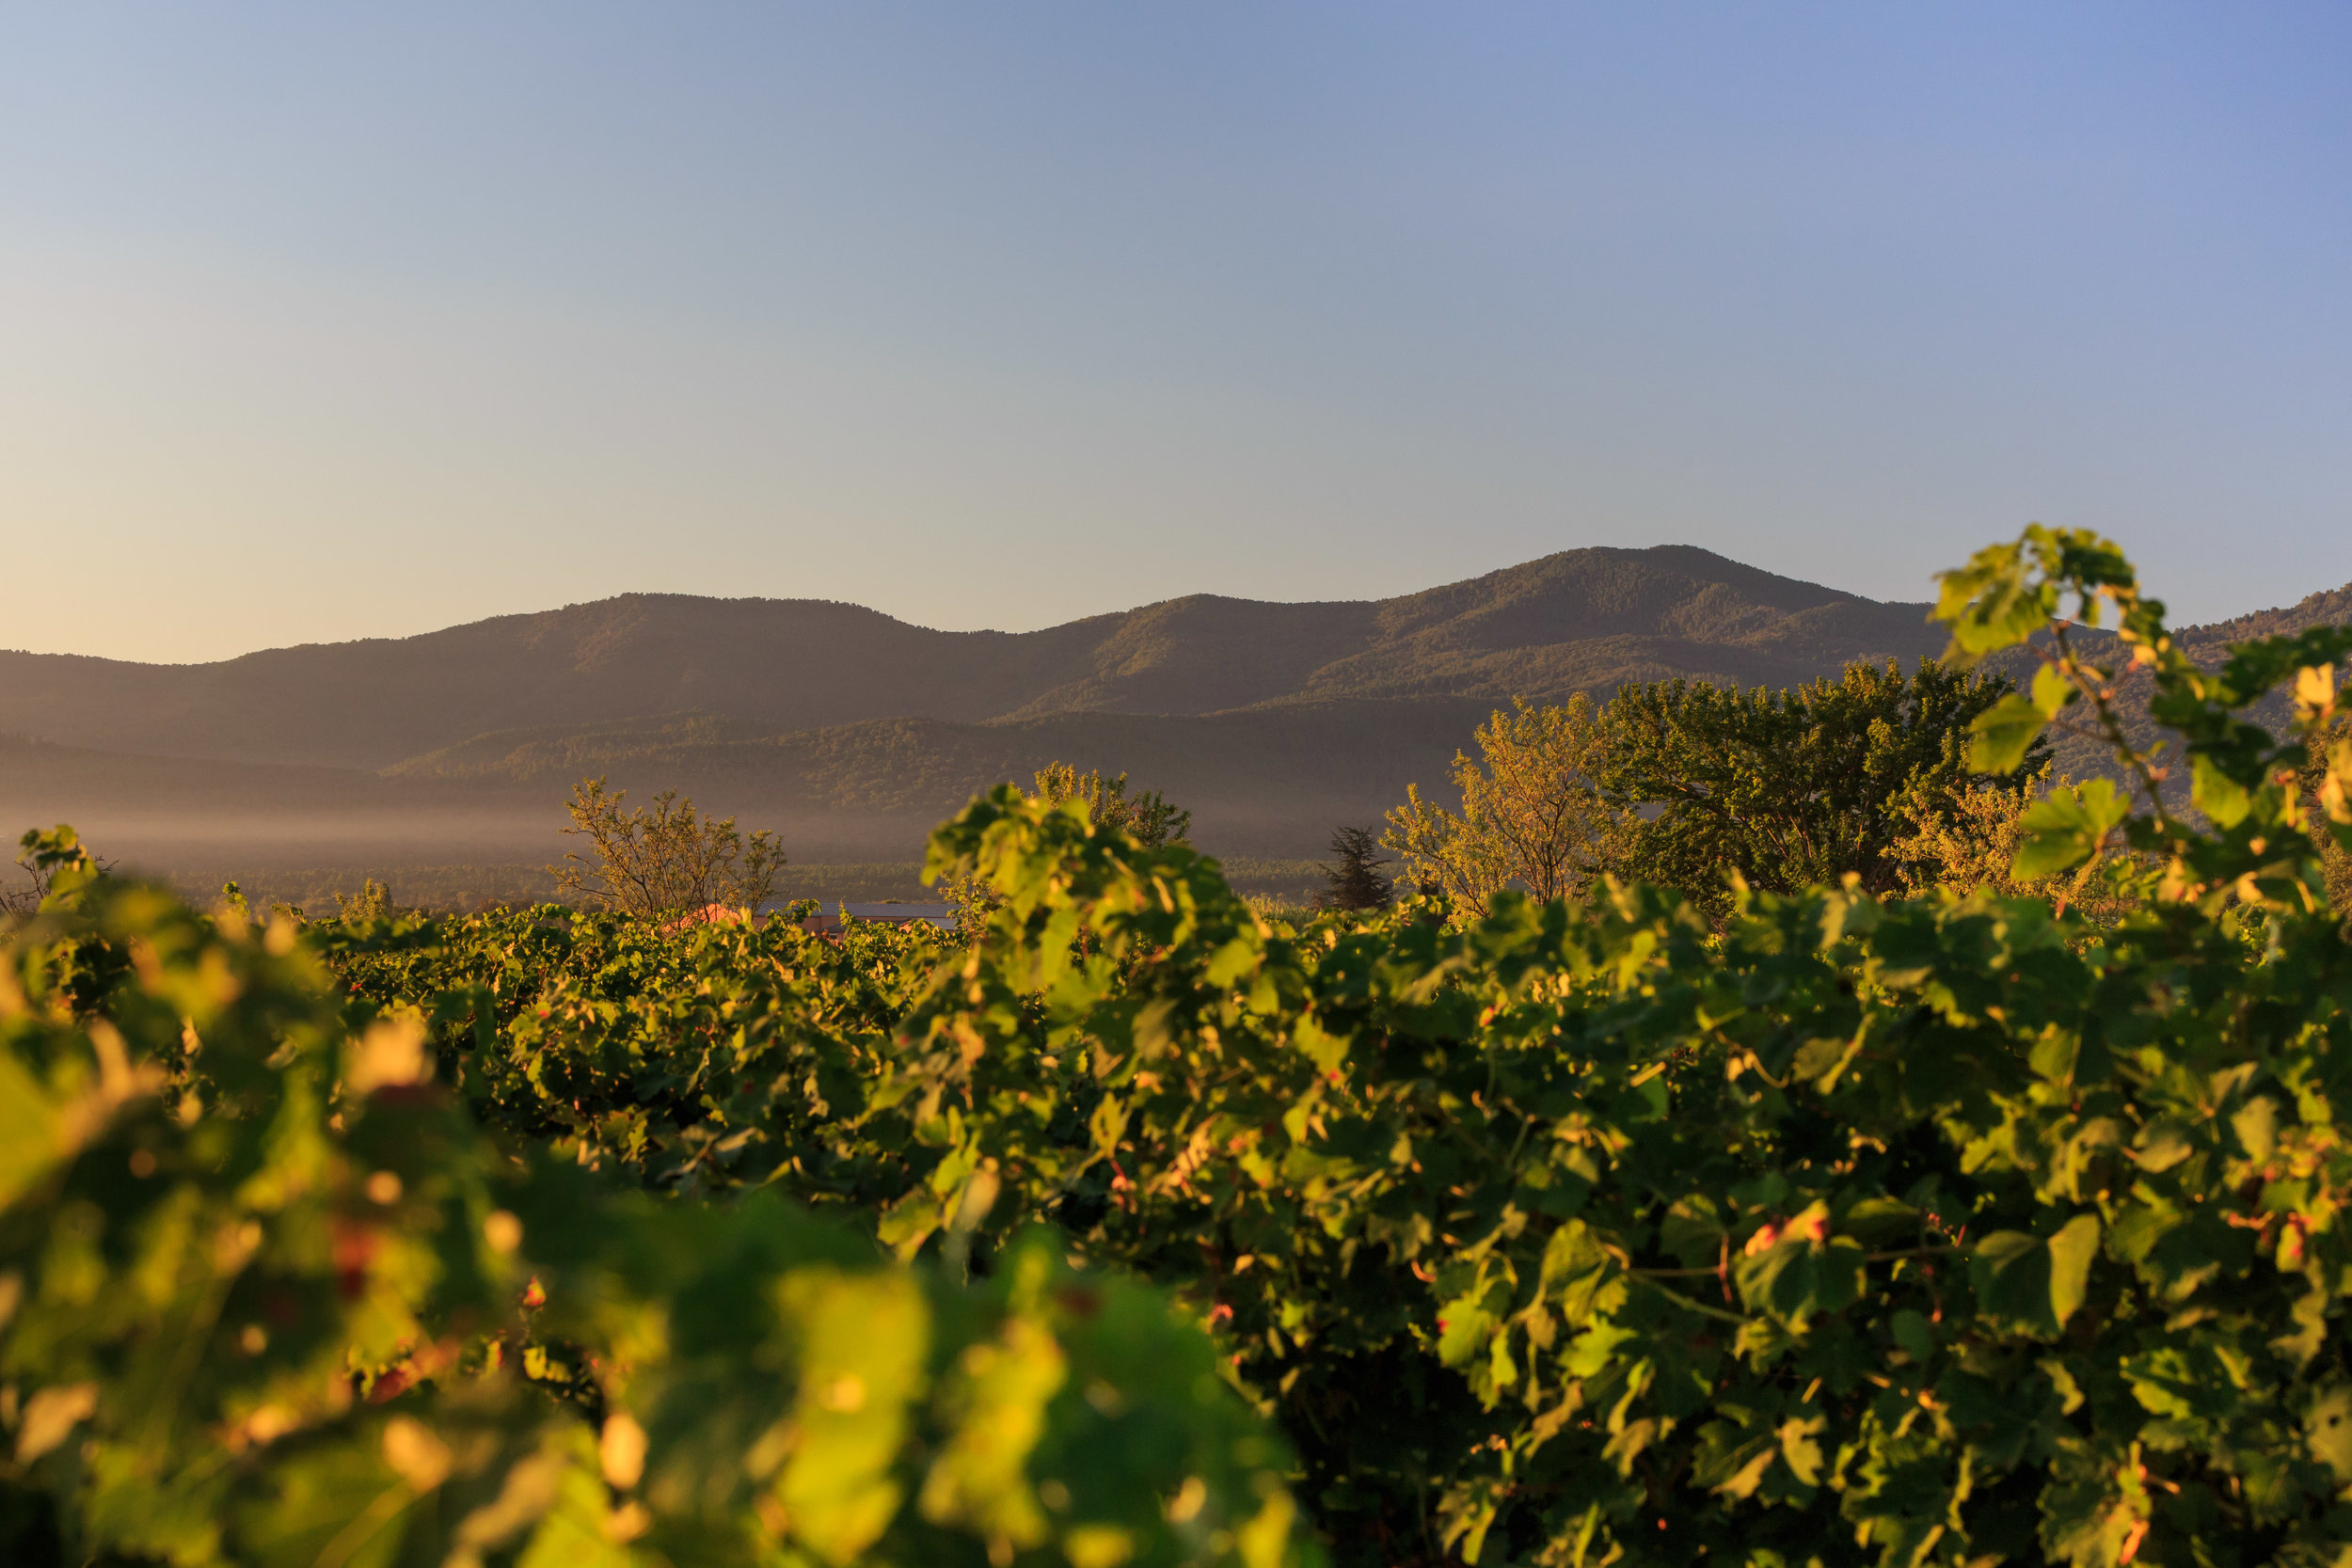 Chateau de brigue vineyard photo 1.jpg